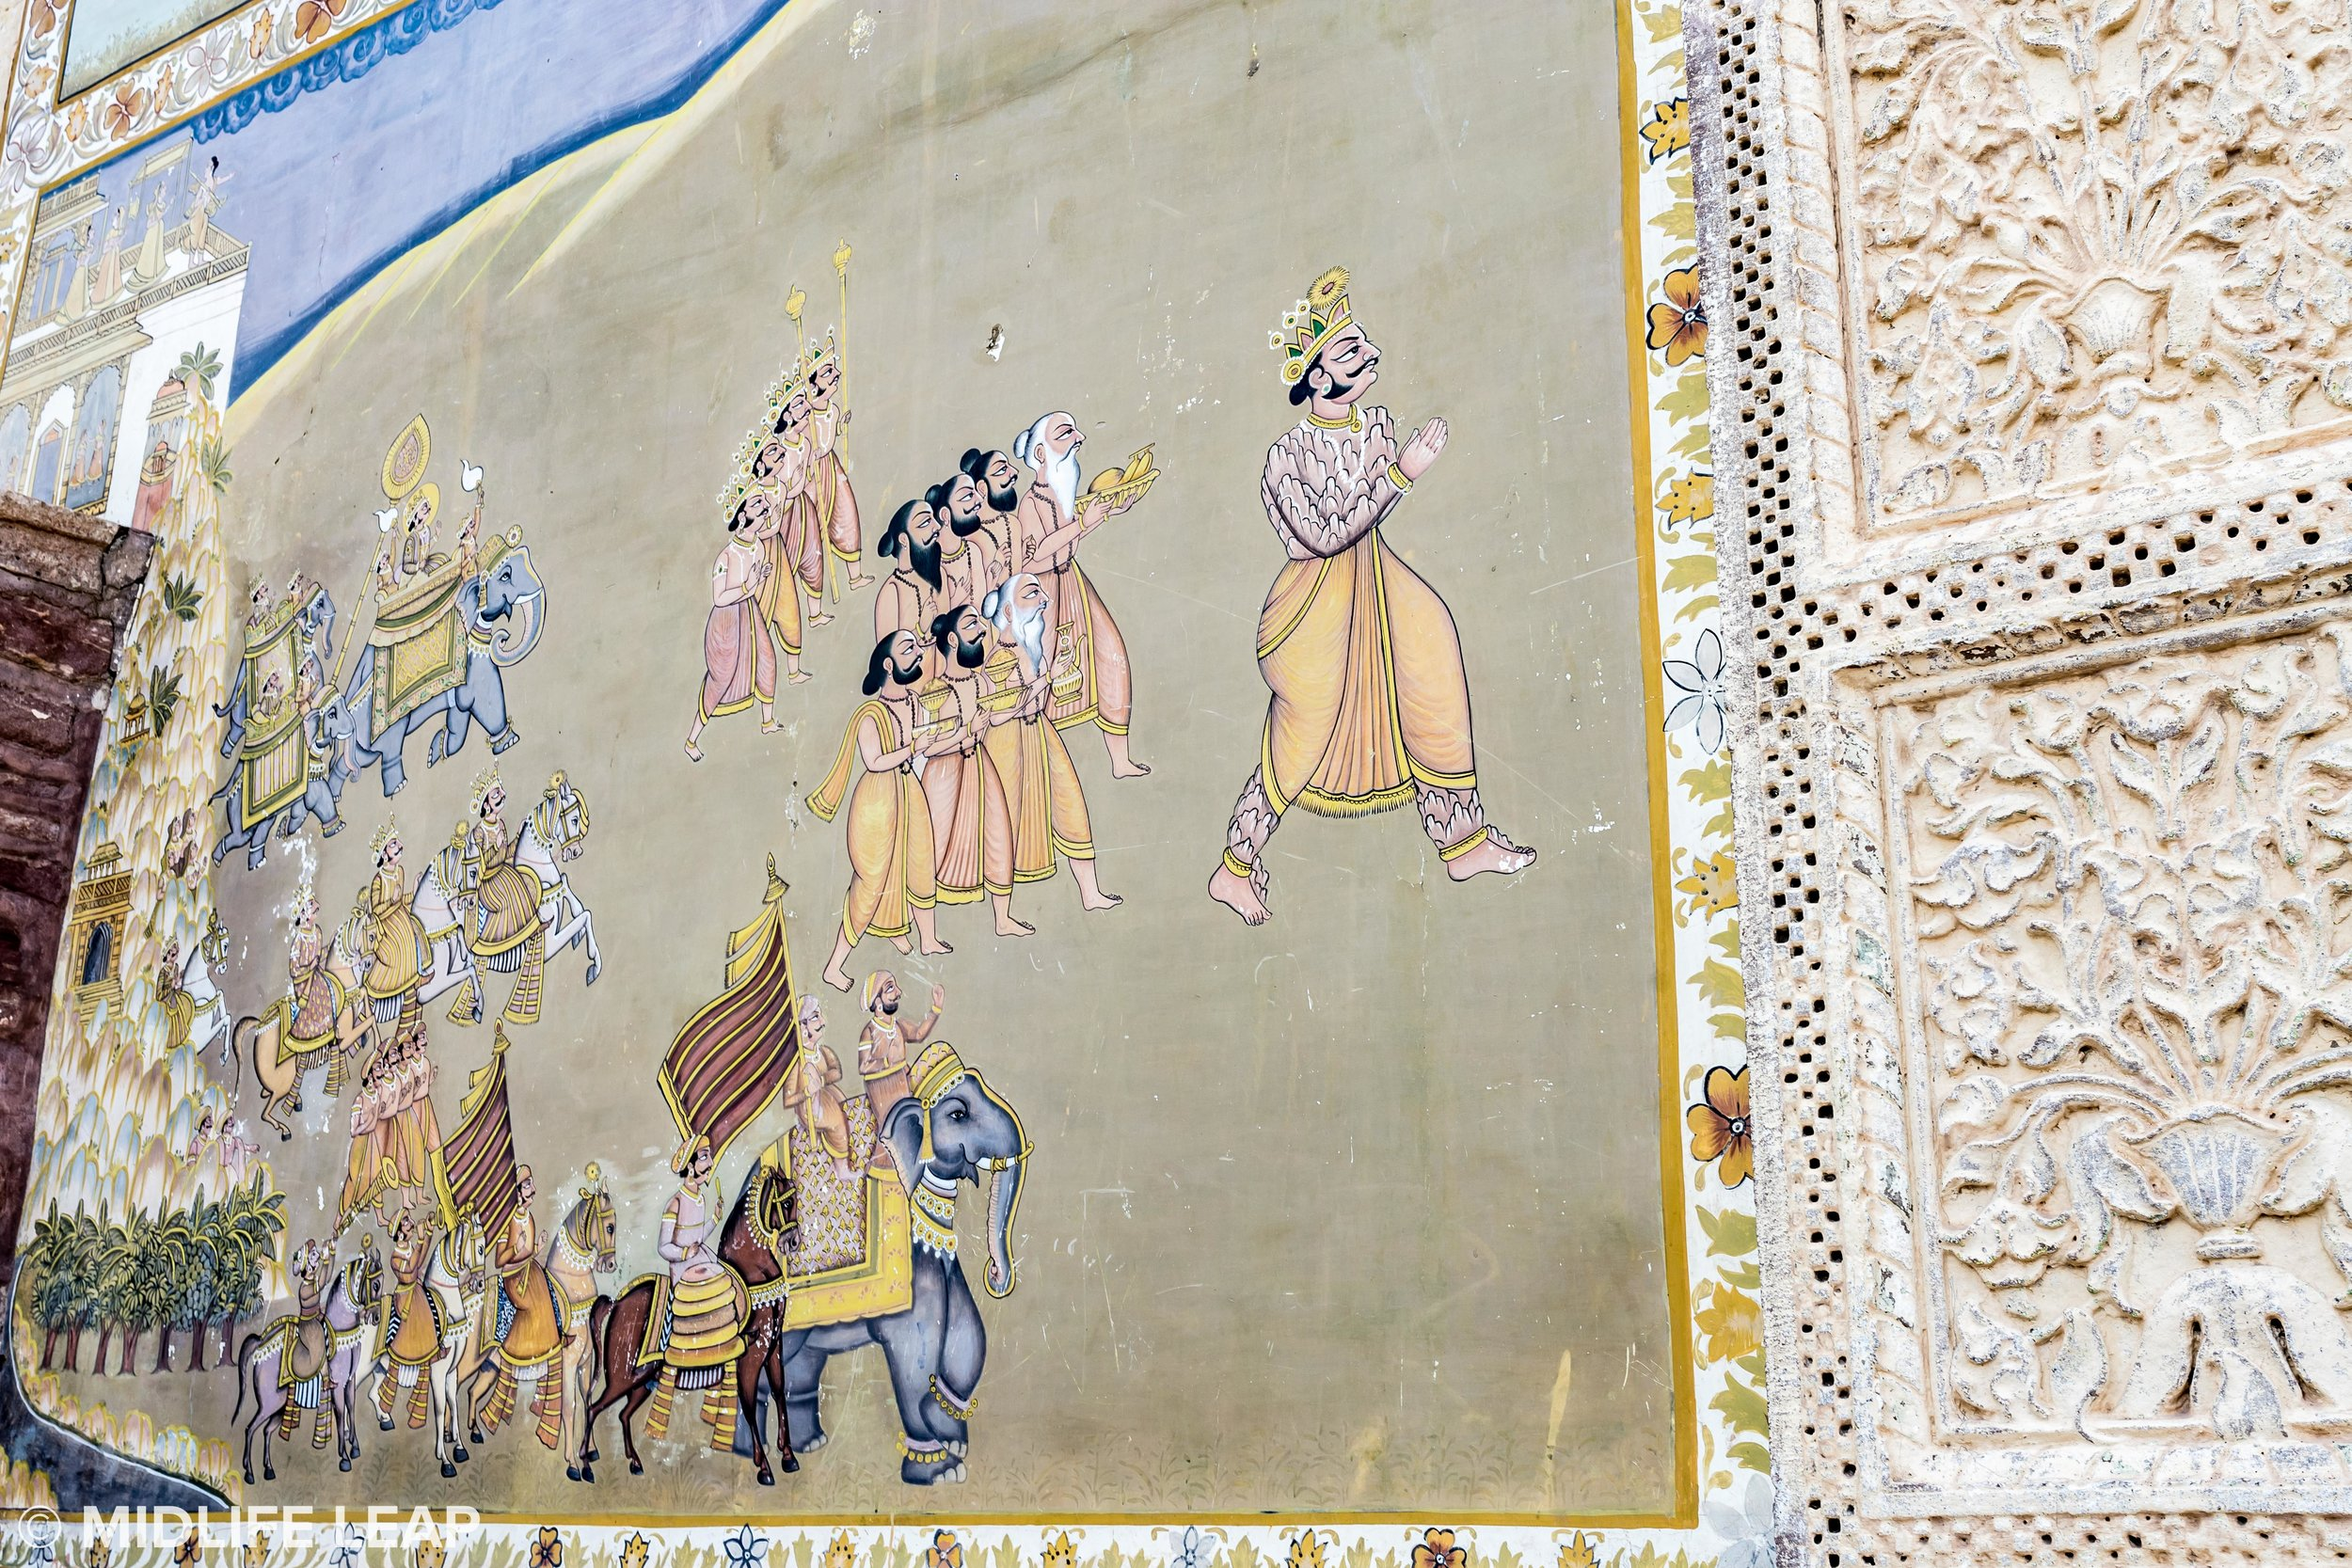 mehrangarh-fort-scenes-jodhpur.jpg